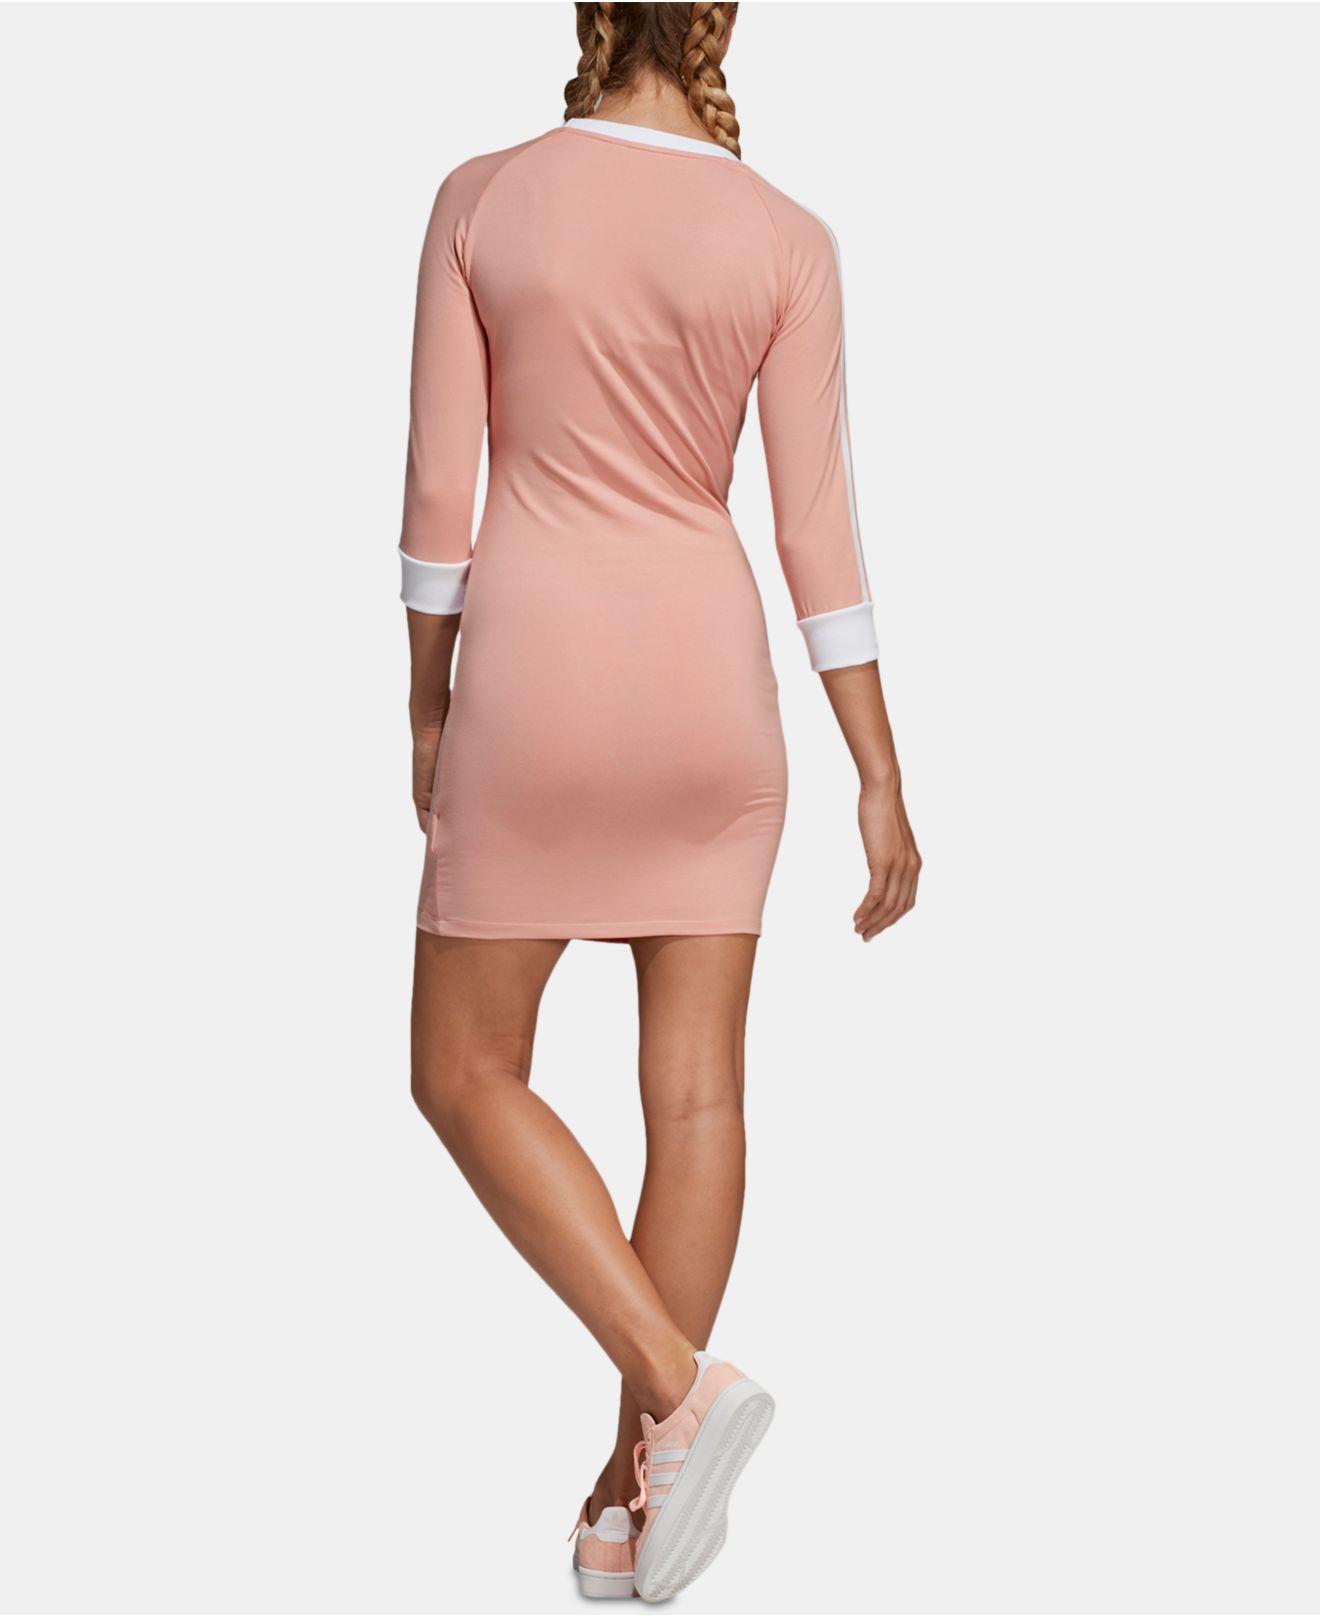 b785772f70a adidas Originals Adicolor 3-stripe Dress in Pink - Lyst